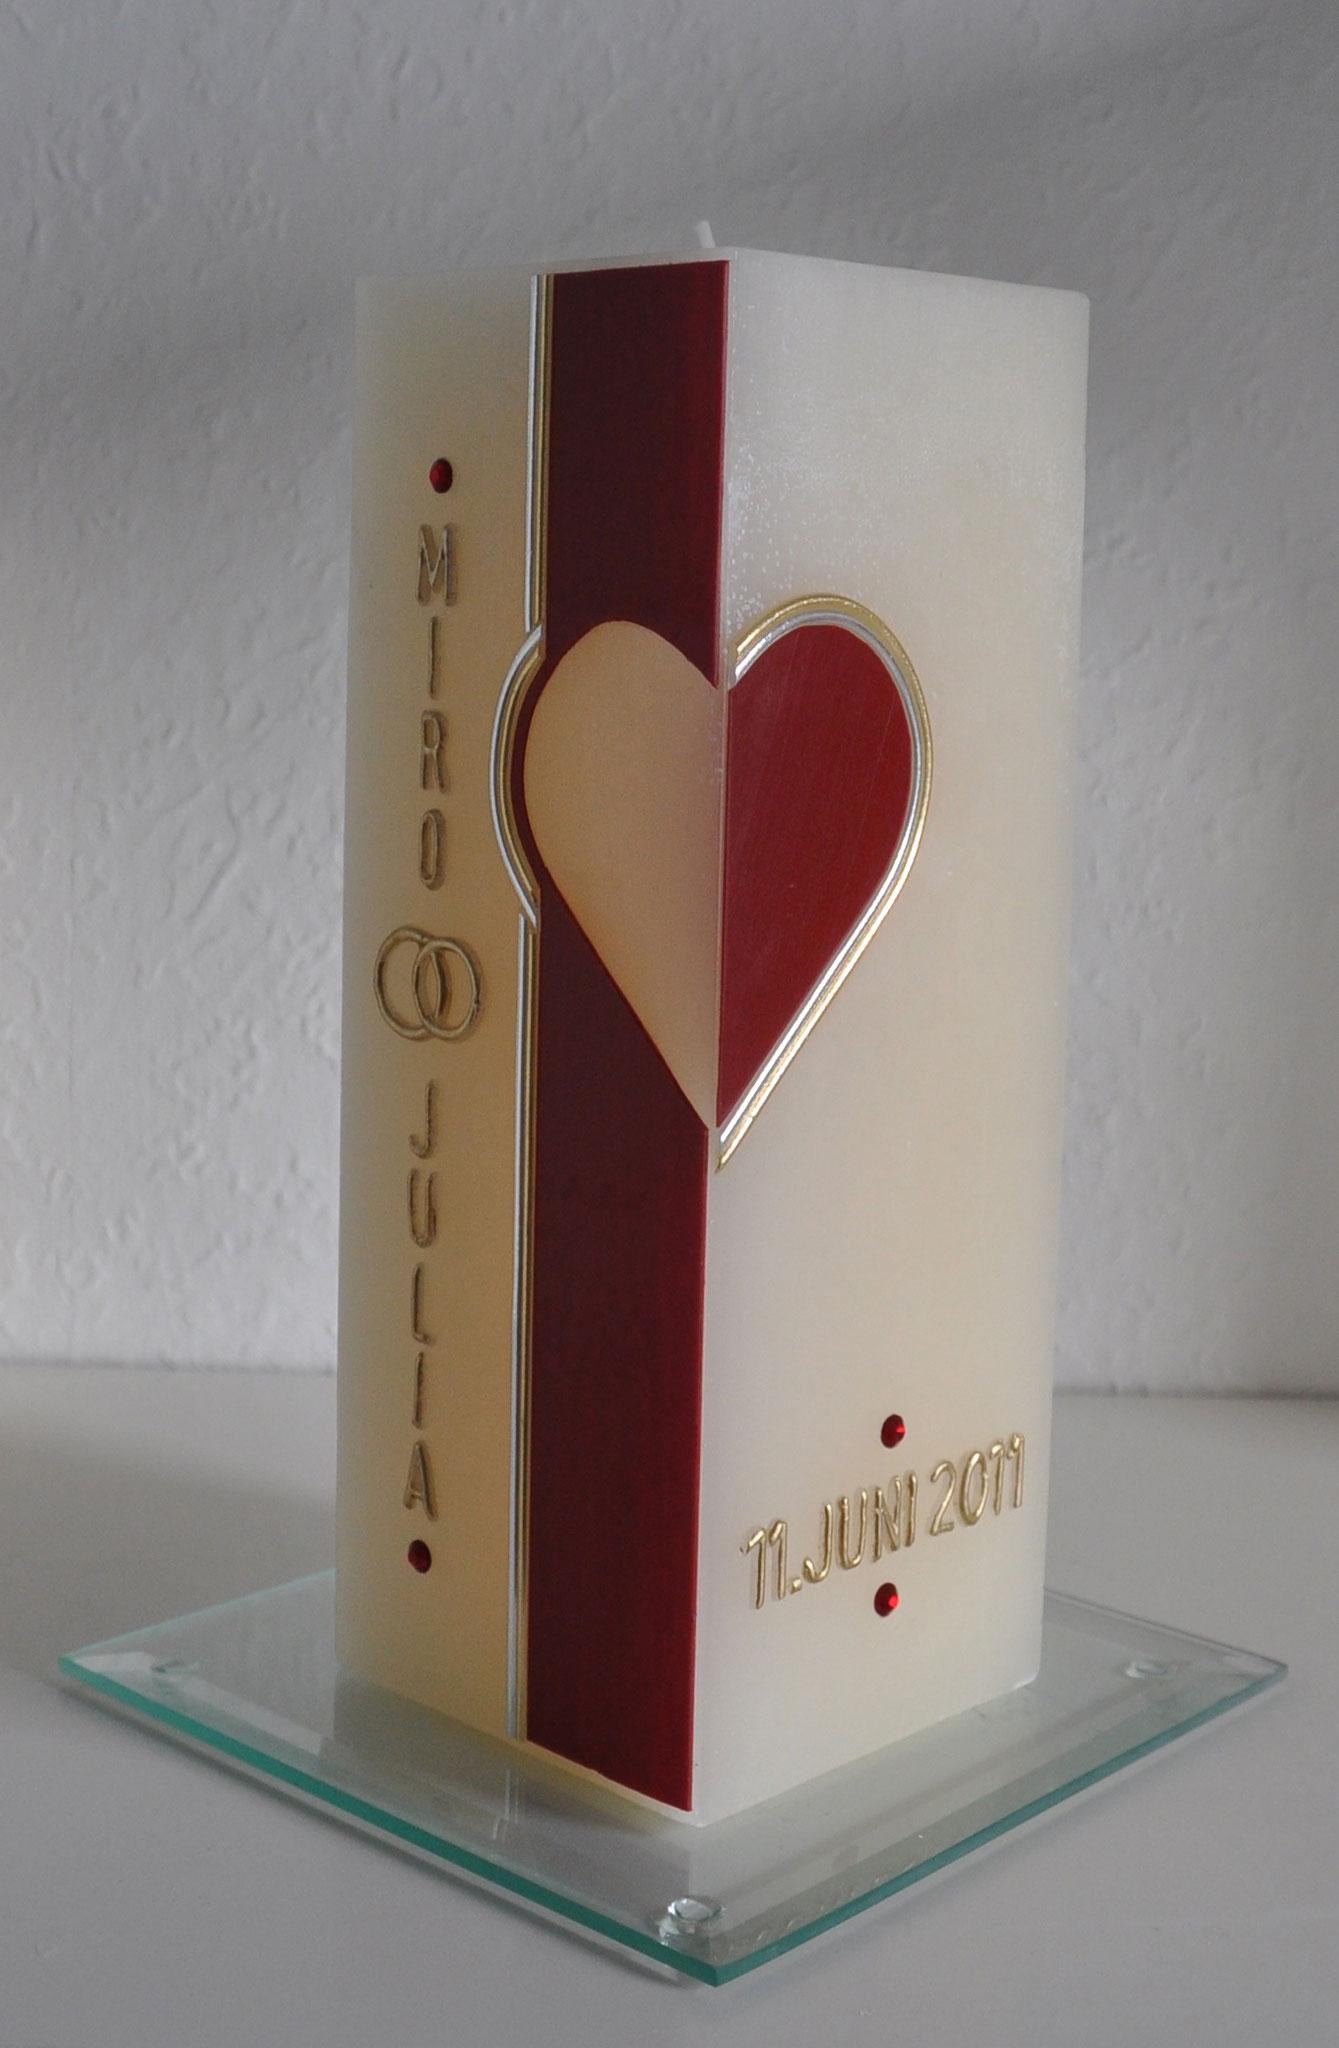 HE-0052, quadratisch, HxB ca 20 cm x 7,5 cm, Preis ca. € 33,--